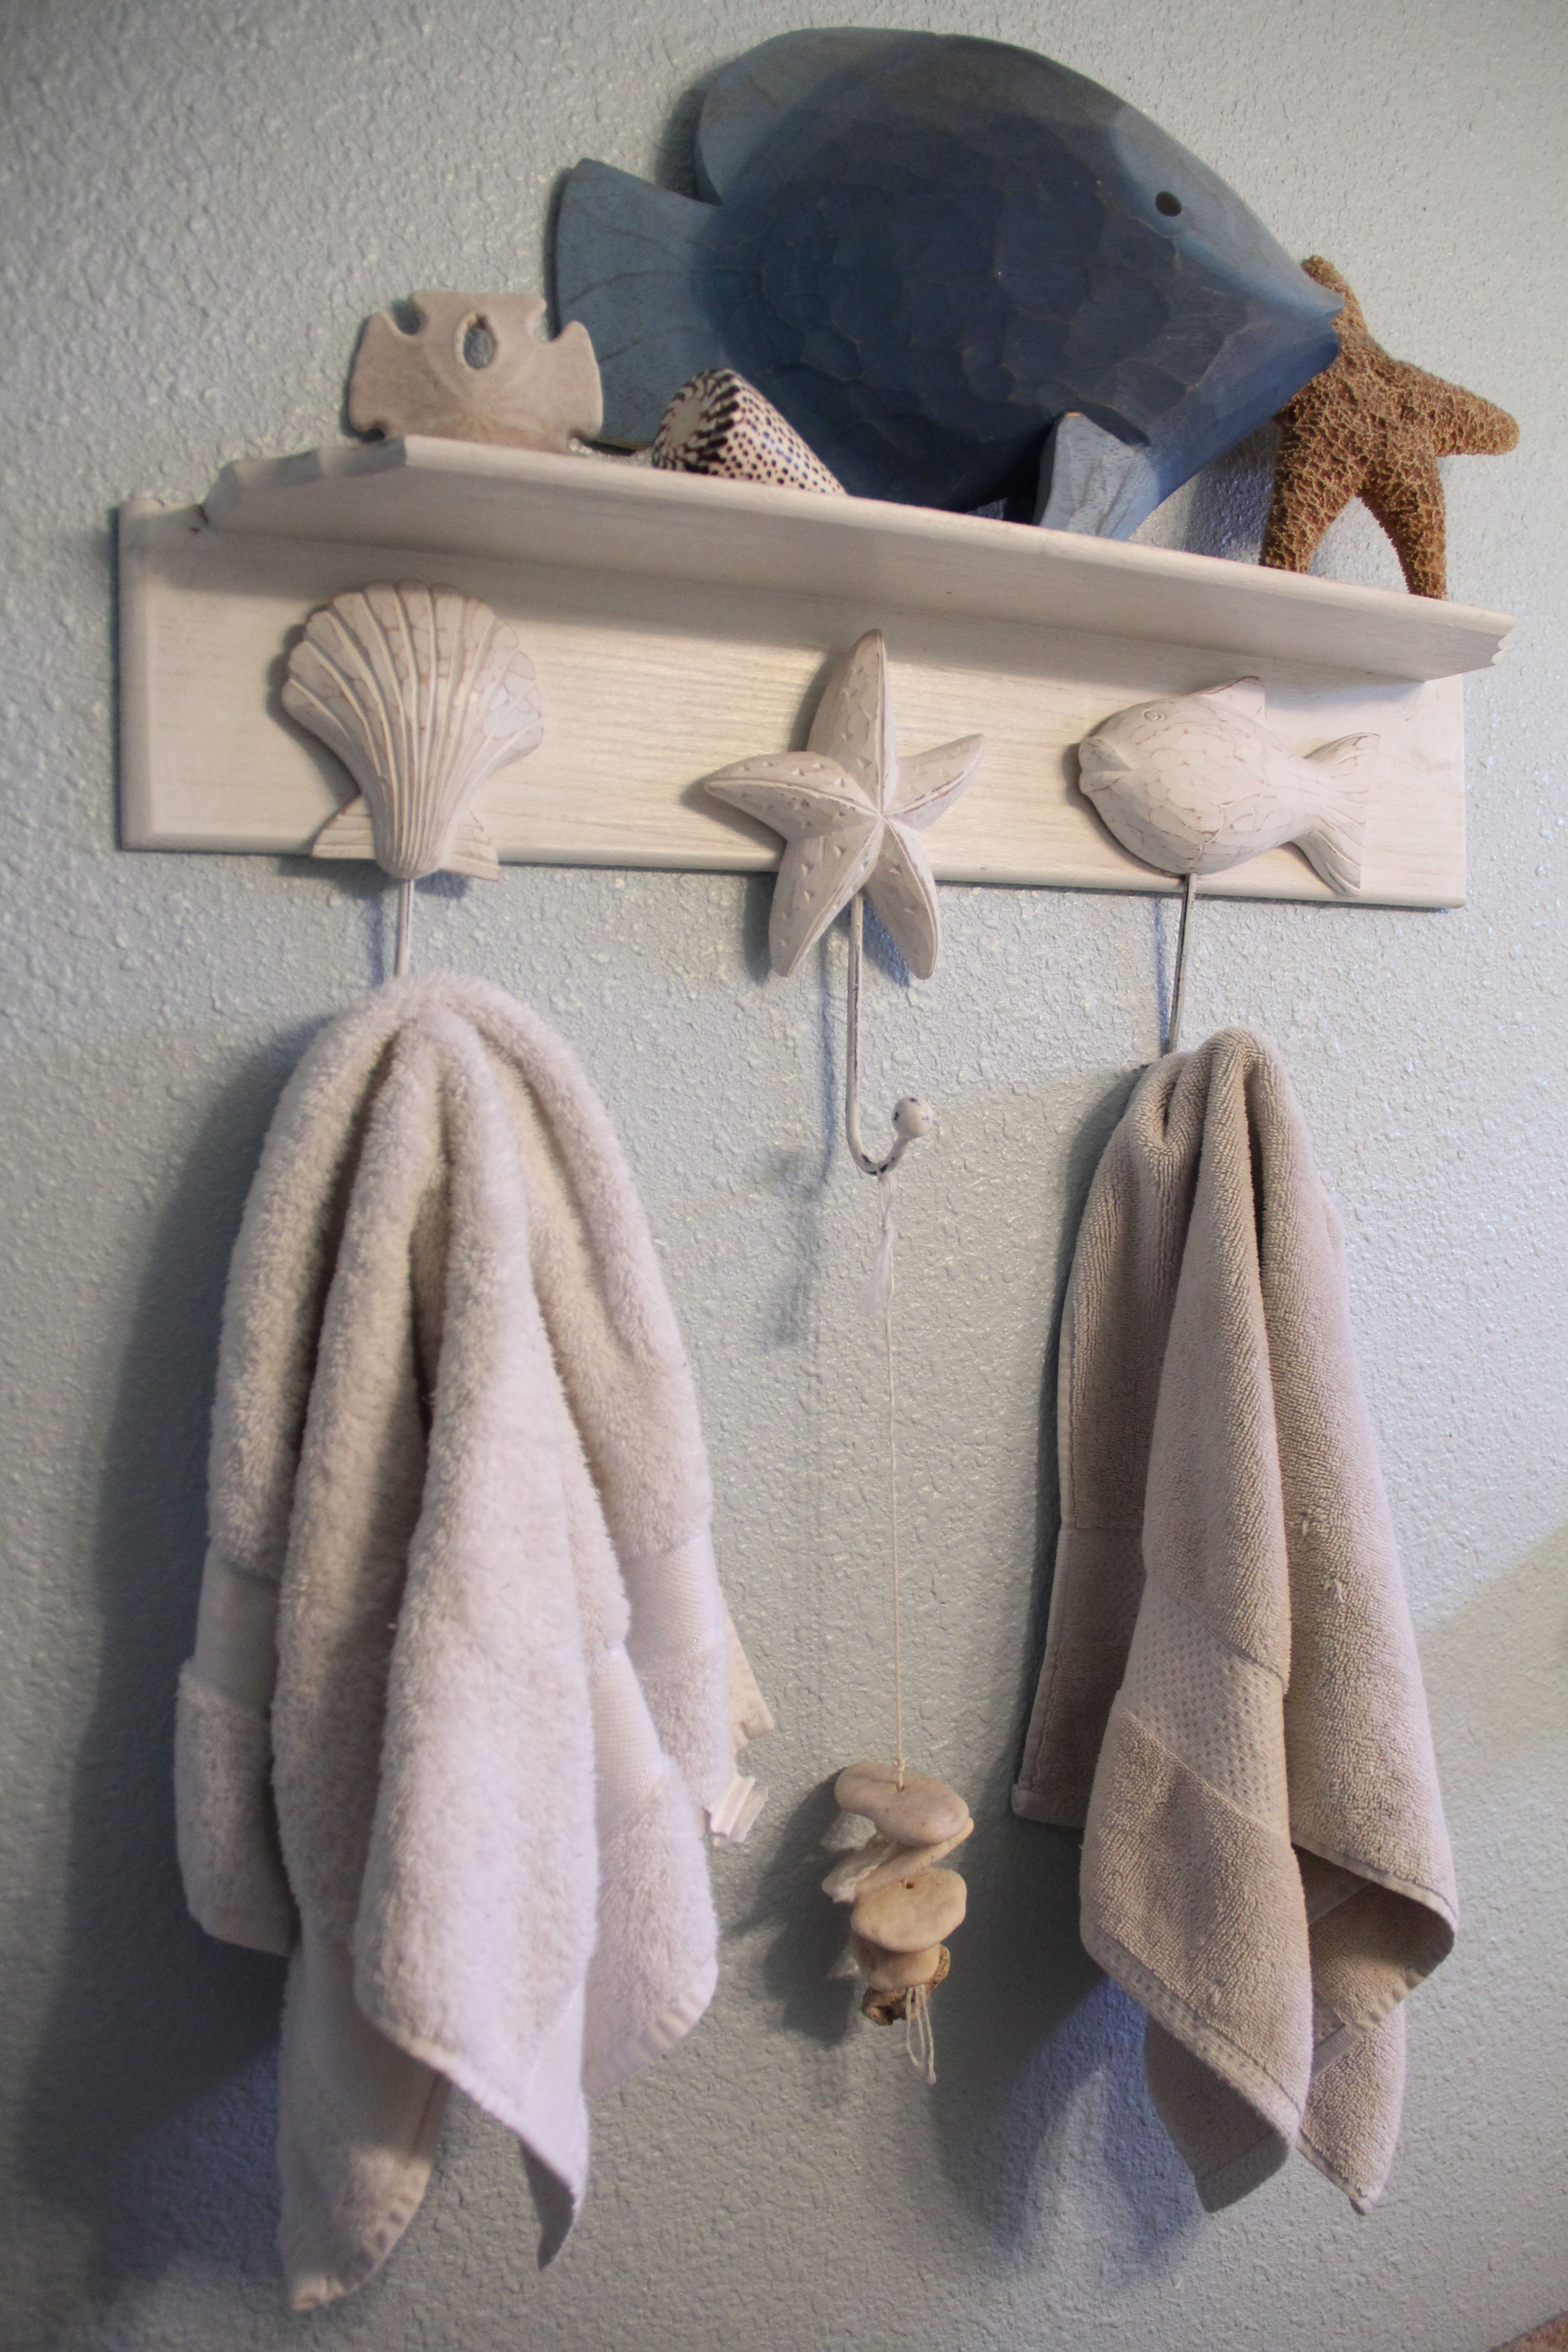 Beach Themed Shelf And Towel Rack Coastal Bathrooms Theme Home